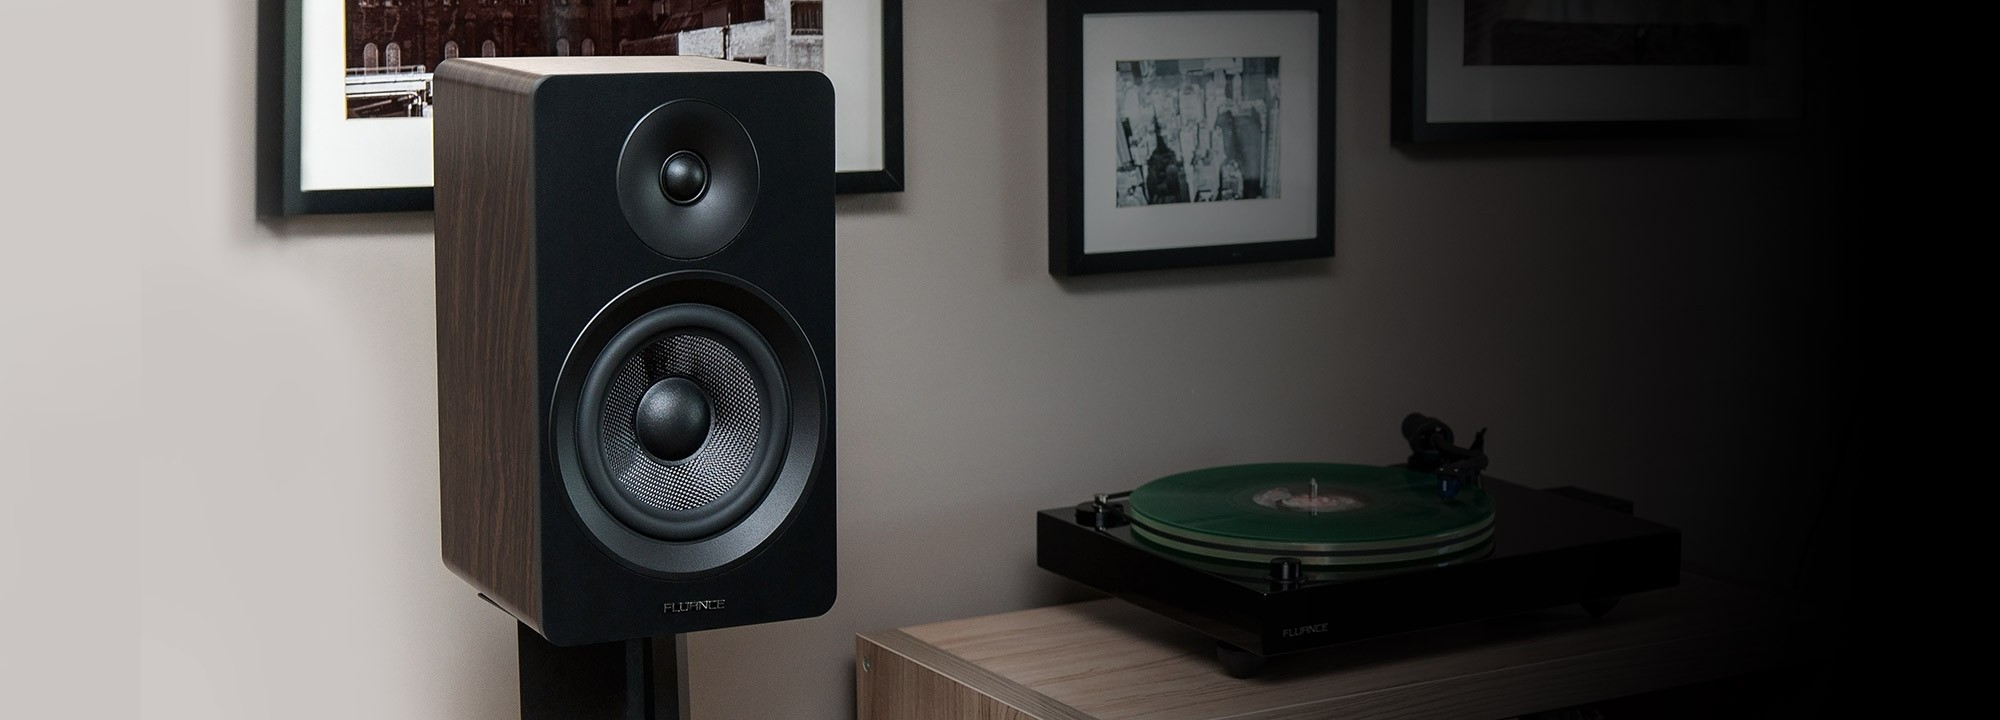 "Ai61B Powered 6.5"" Stereo Bookshelf Speakers"